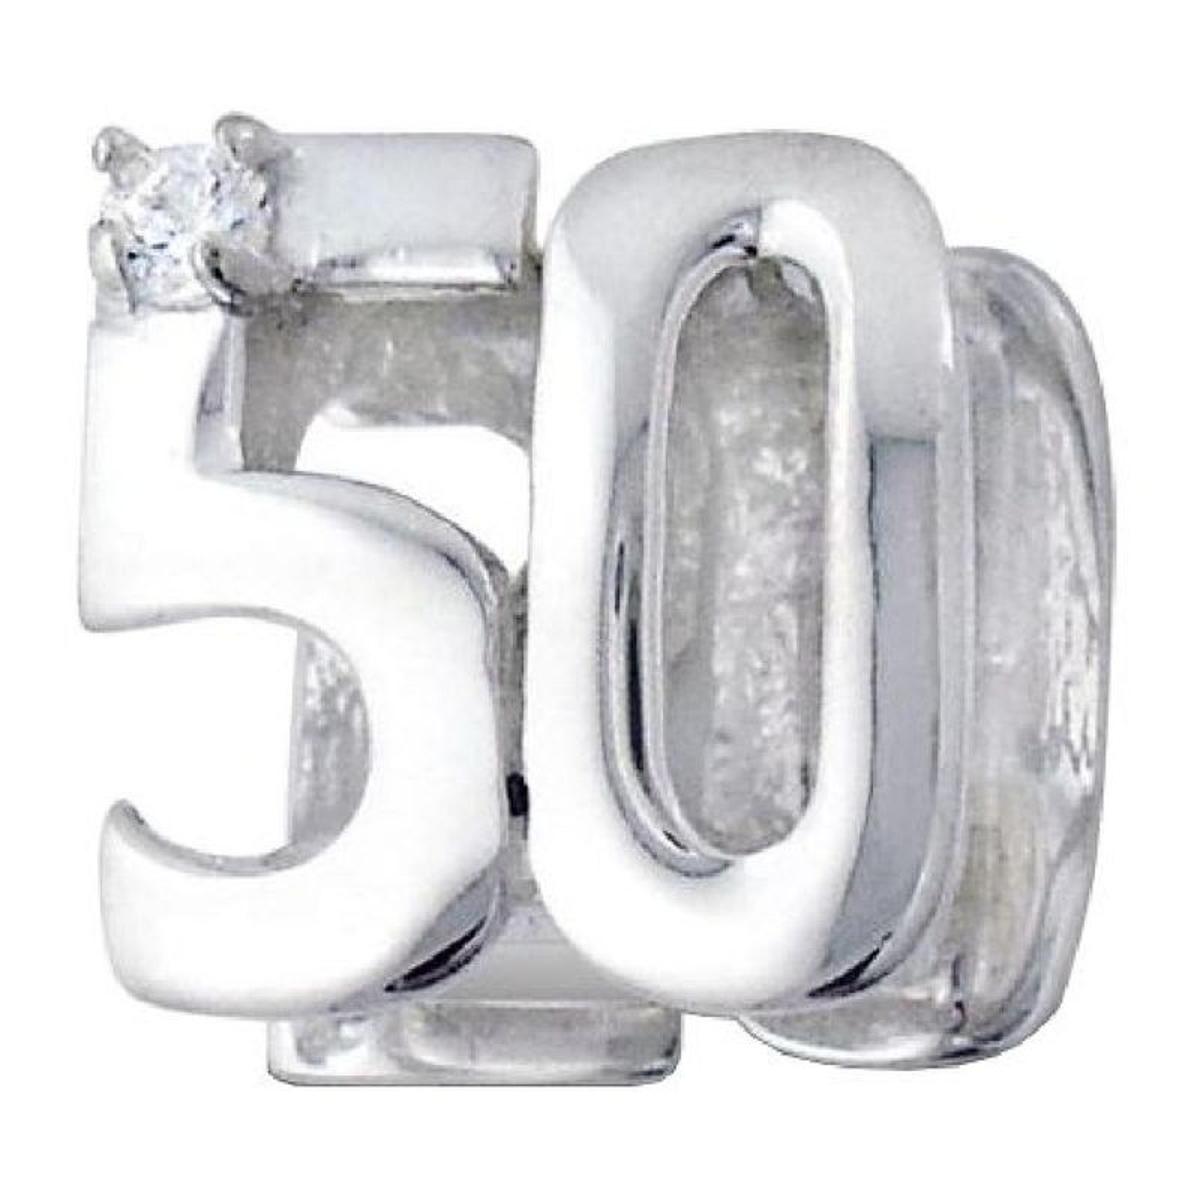 Charm 50 Ans Anniversaire - Charms Compatibles Pandora, Trollbeads, Chamilia, Biagi - Argent 925